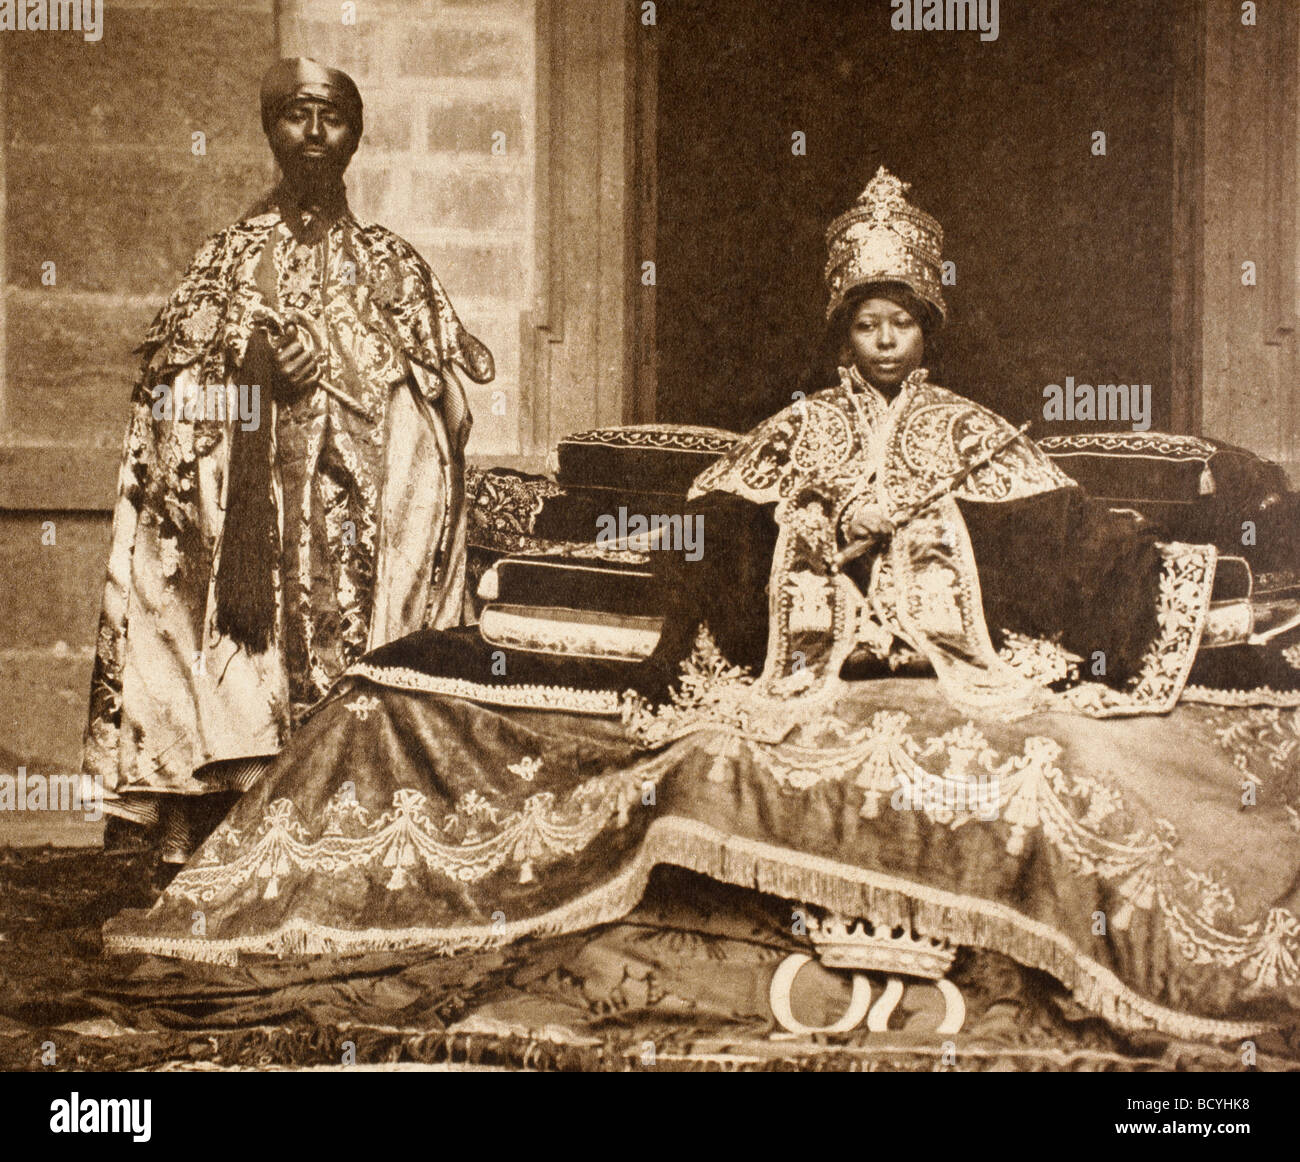 Zewditu I 1876 to 1930 Empress of Ethiopia from 1916 to 1930. - Stock Image